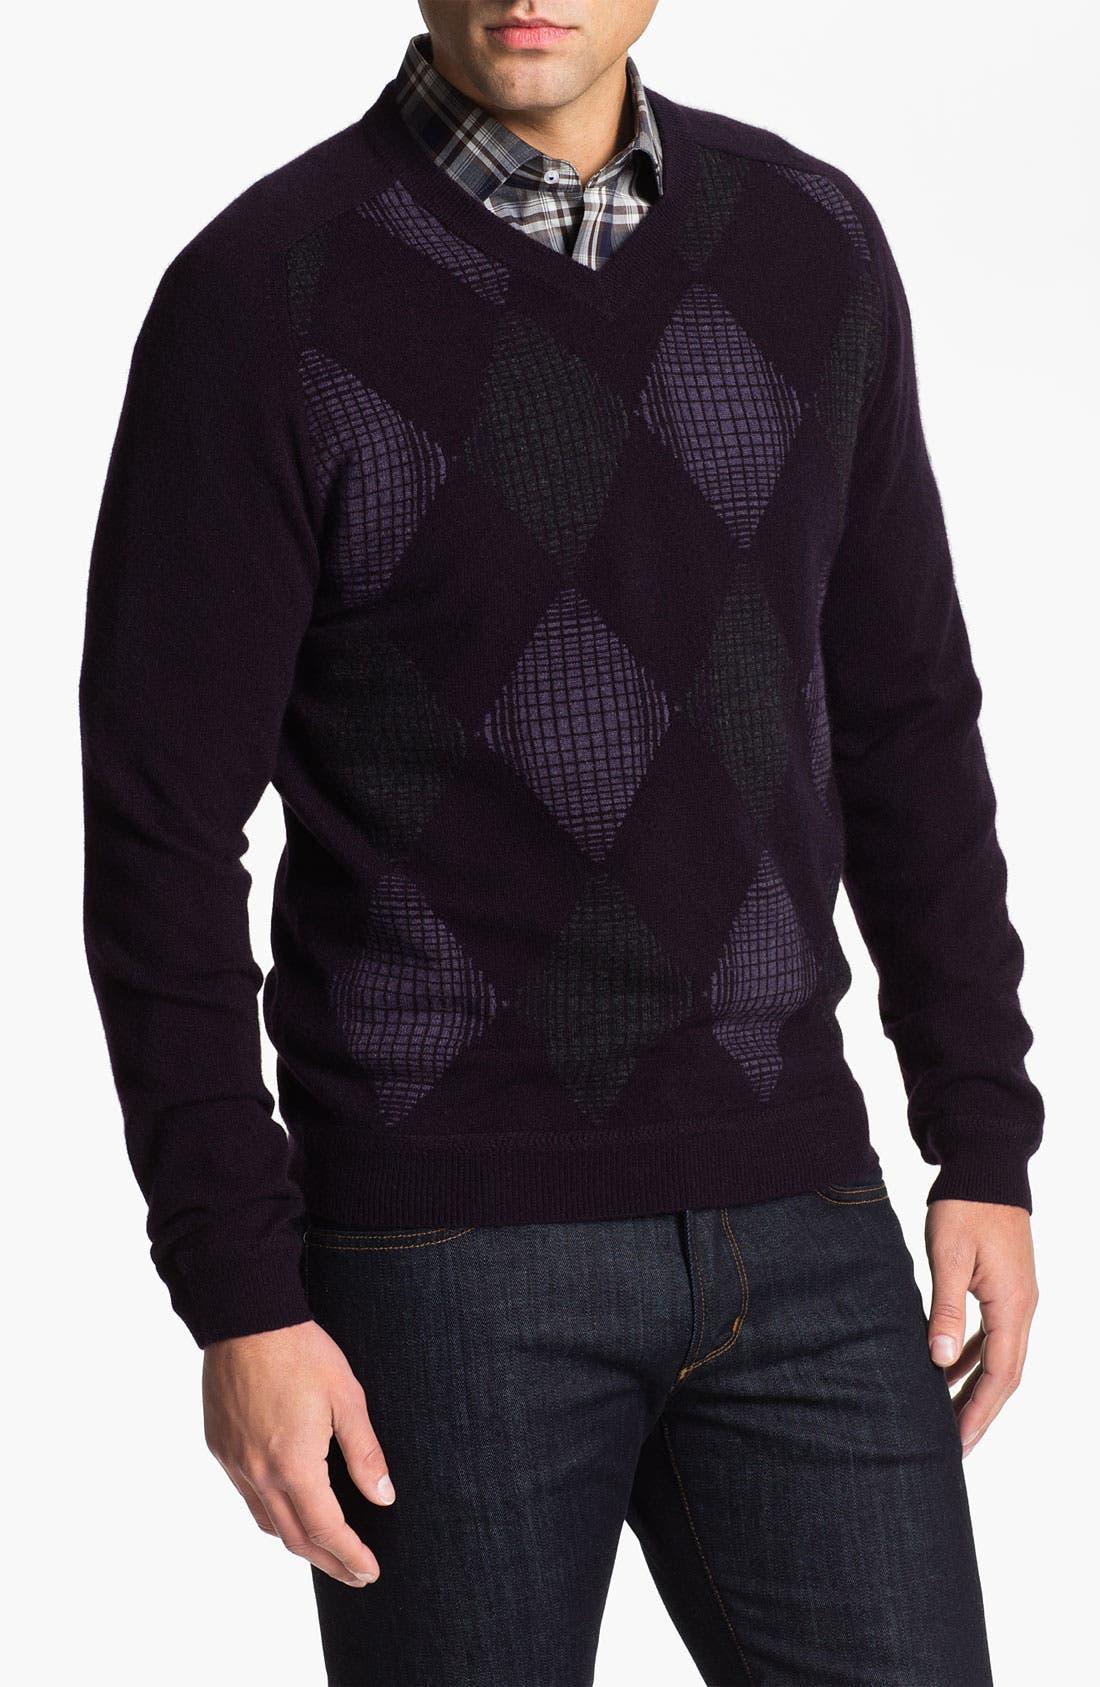 Alternate Image 1 Selected - John W. Nordstrom® Cashmere V-Neck Sweater